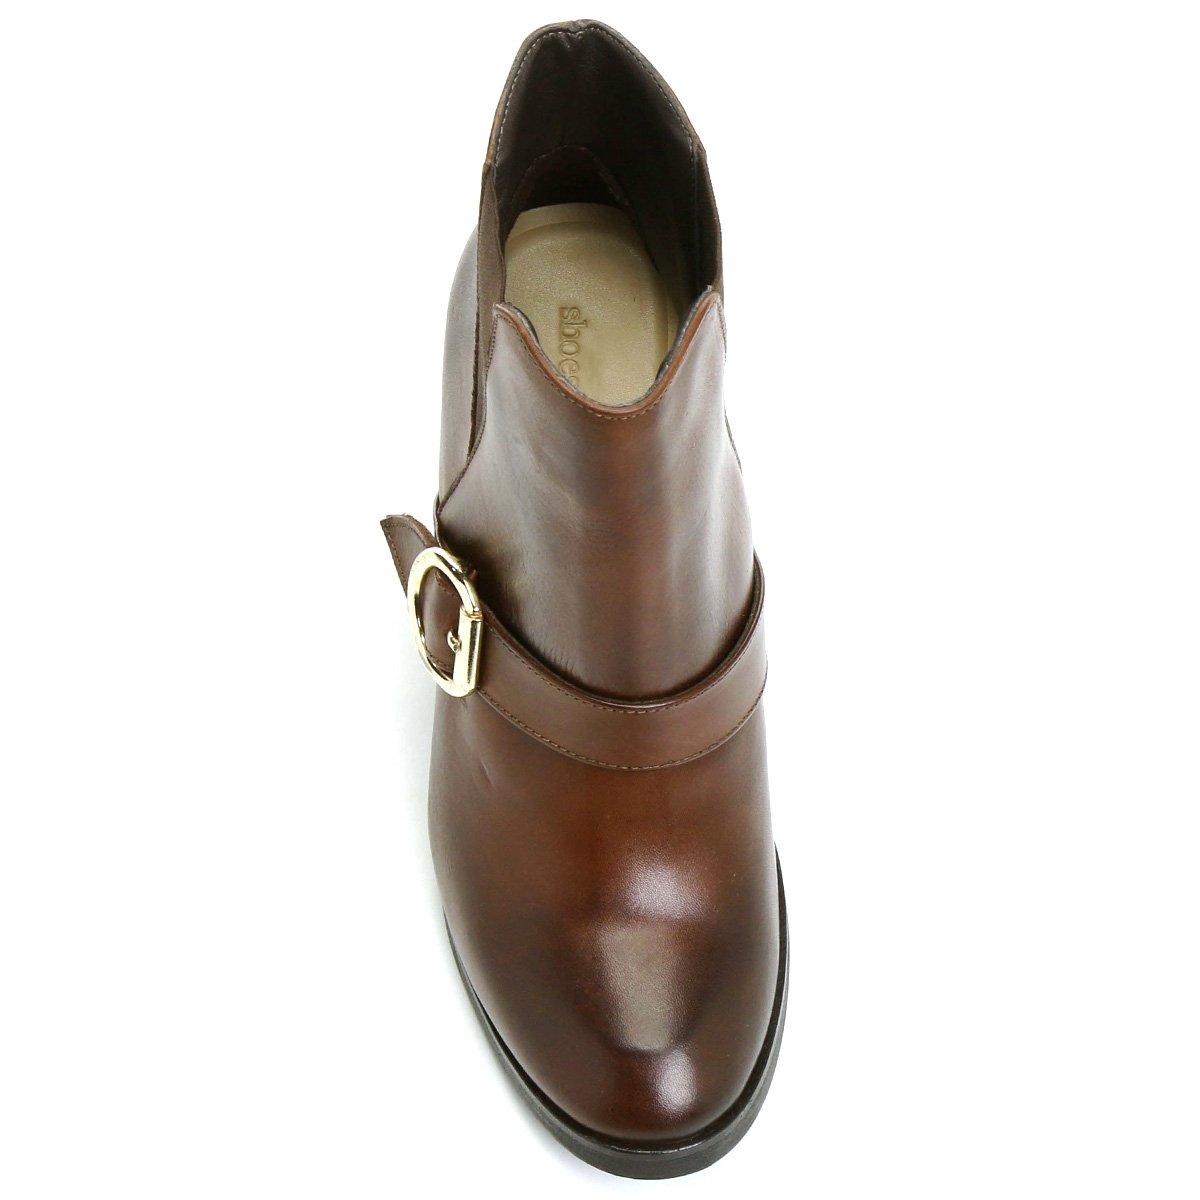 20d54697ce Bota Couro Cano Curto Shoestock Fivela Feminina - Compre Agora